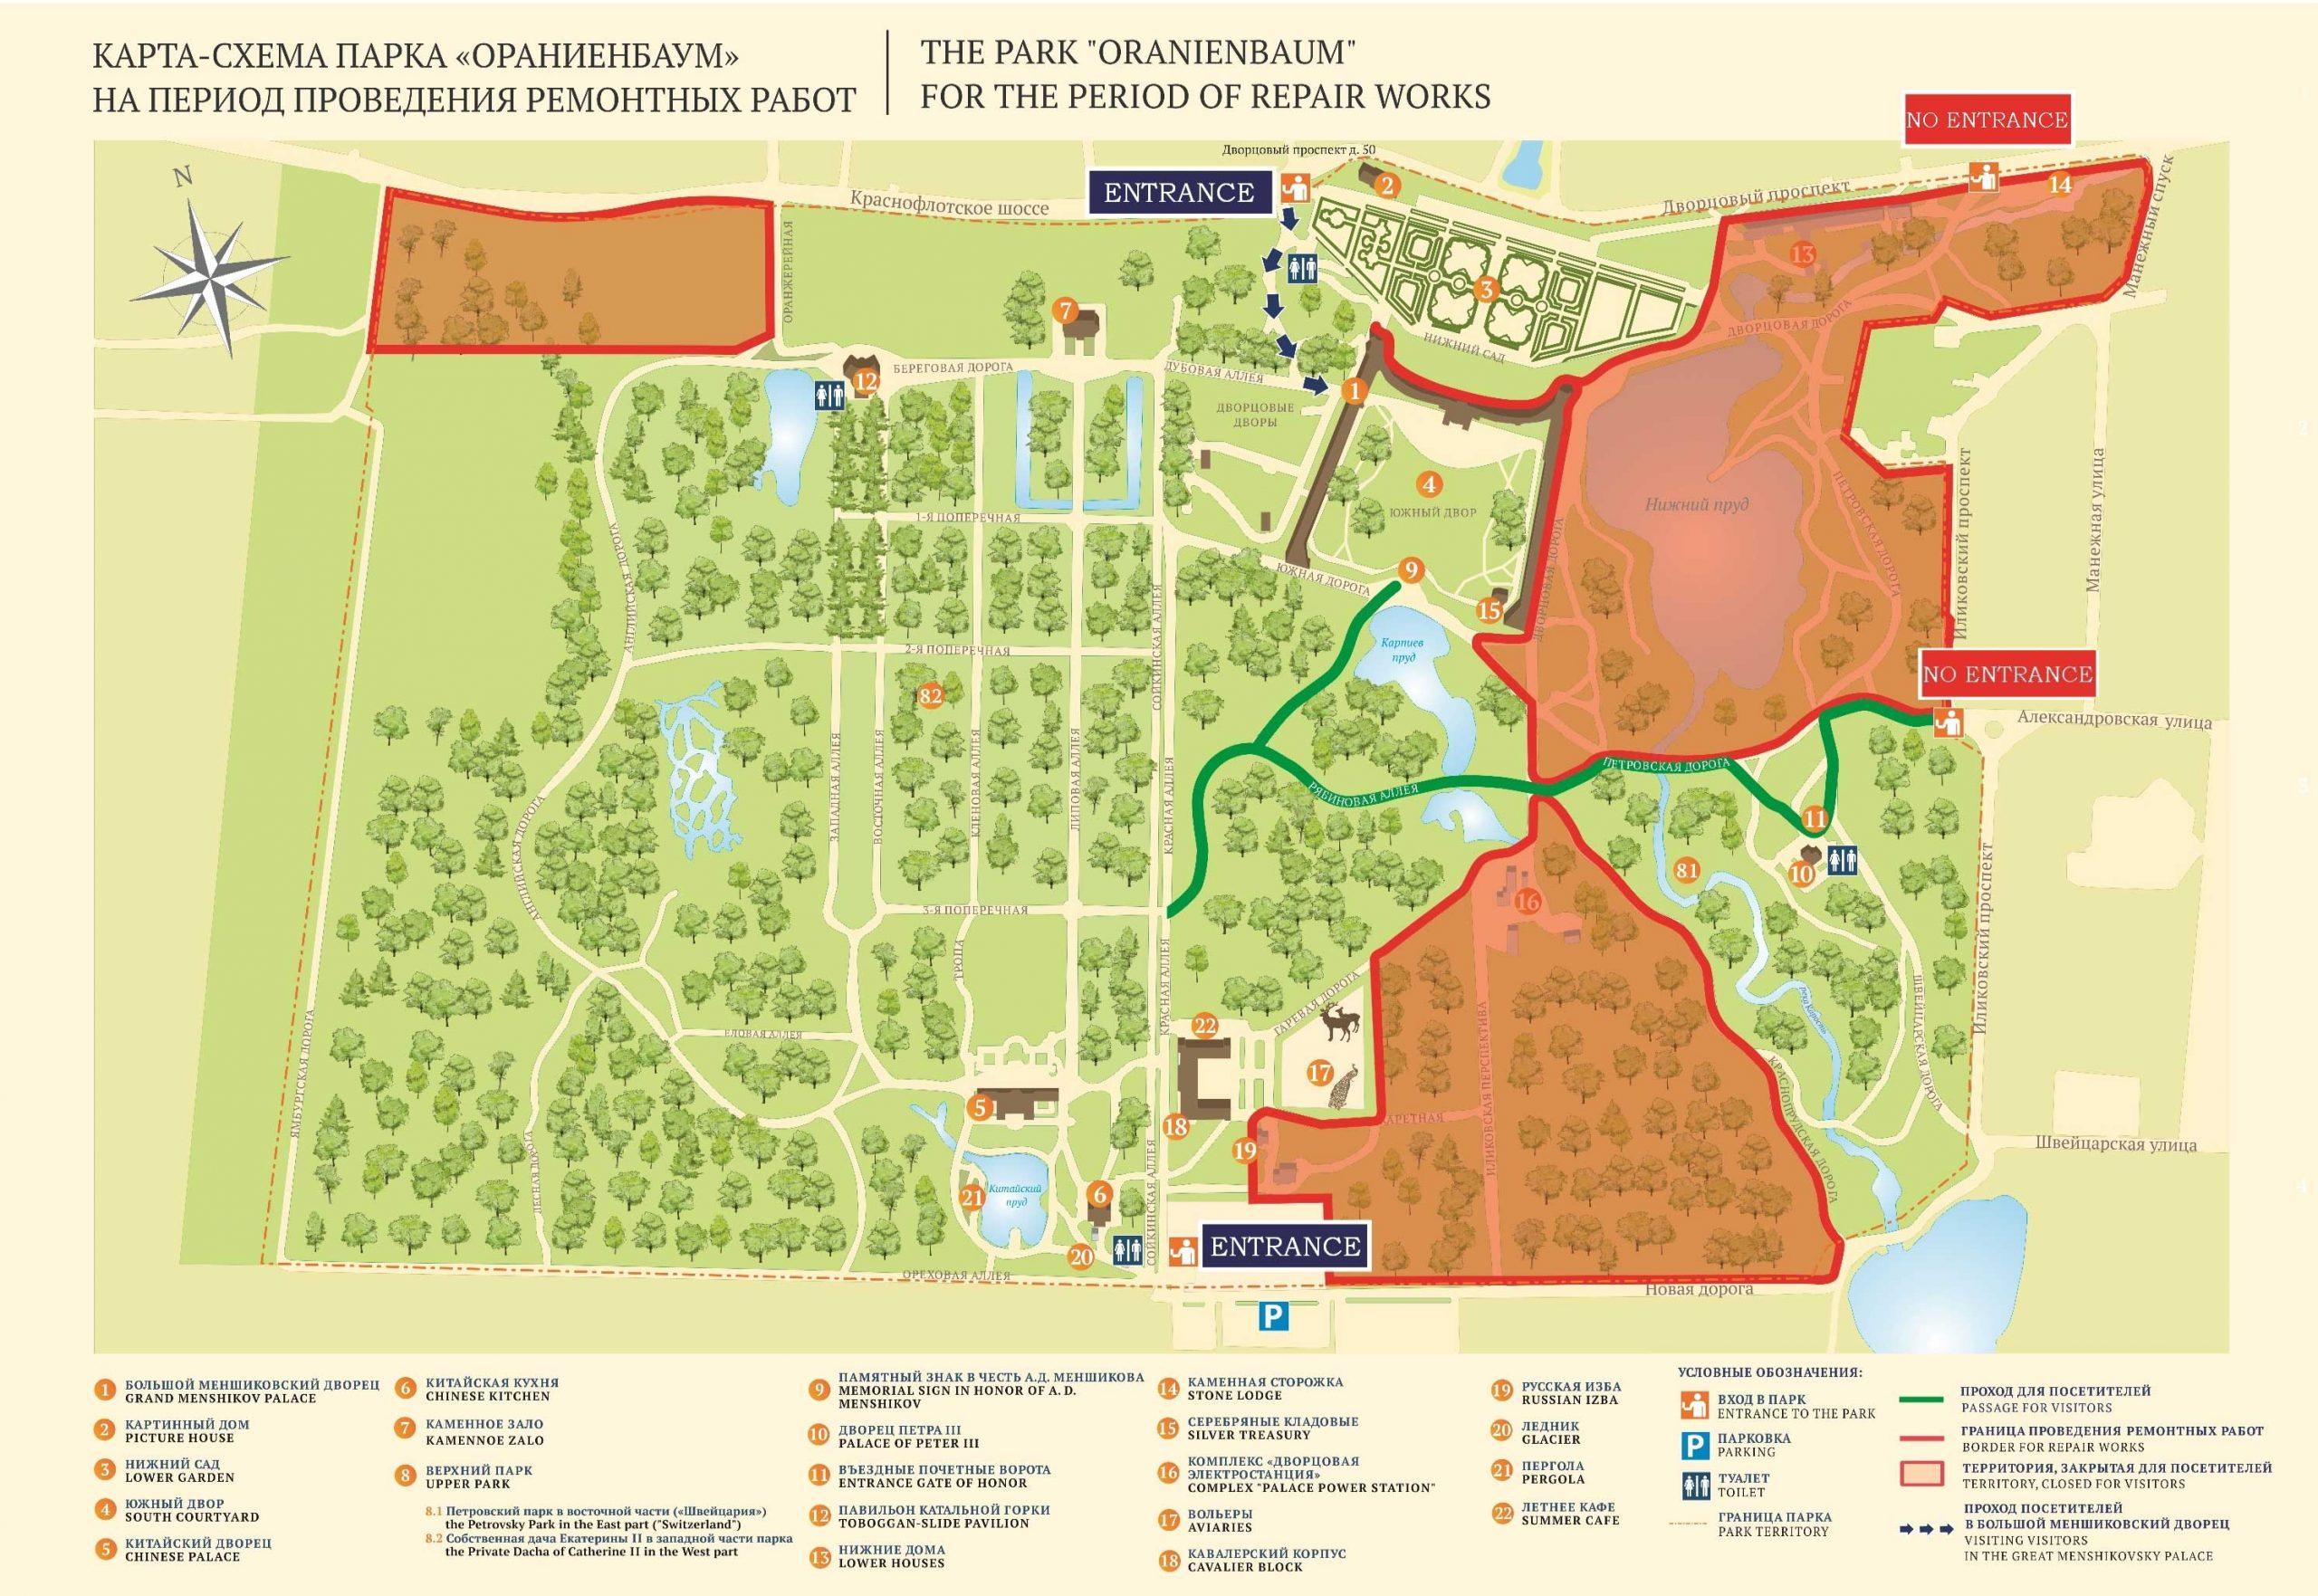 Карта-схема парка Ораниенбаум